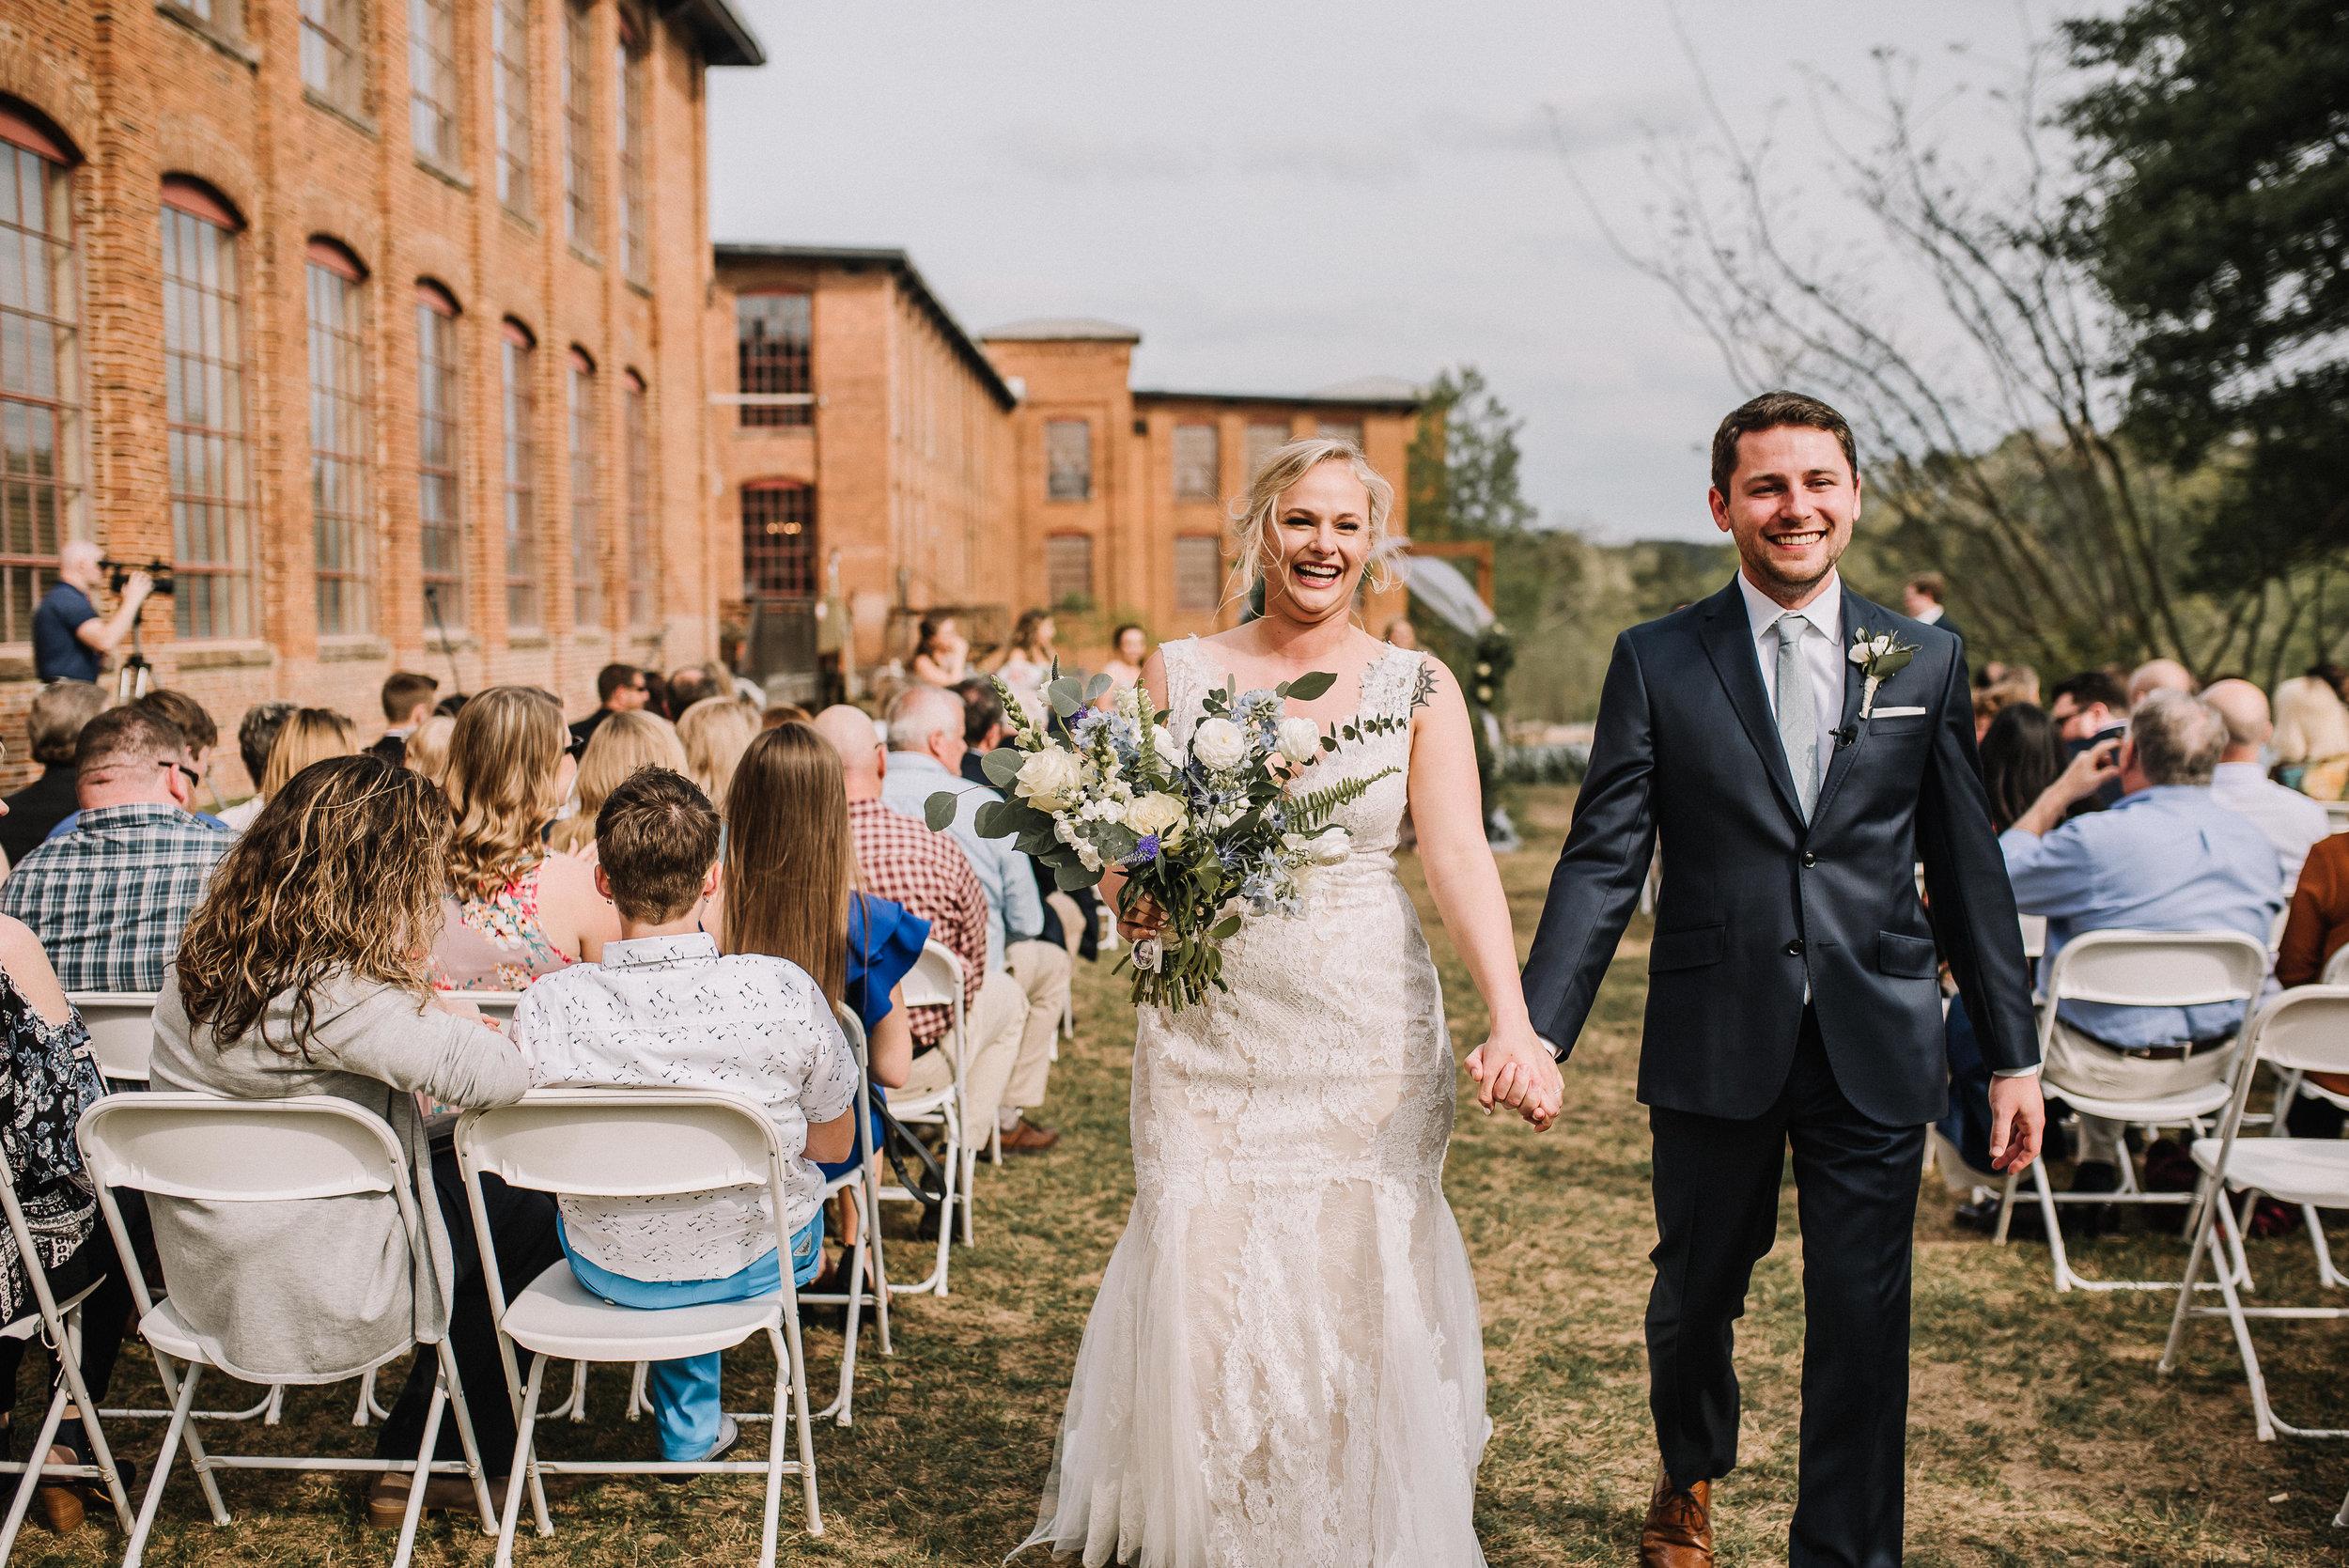 Morgan Wedding_Mill at Yellow River_Ashley Benham Photography-665.jpg